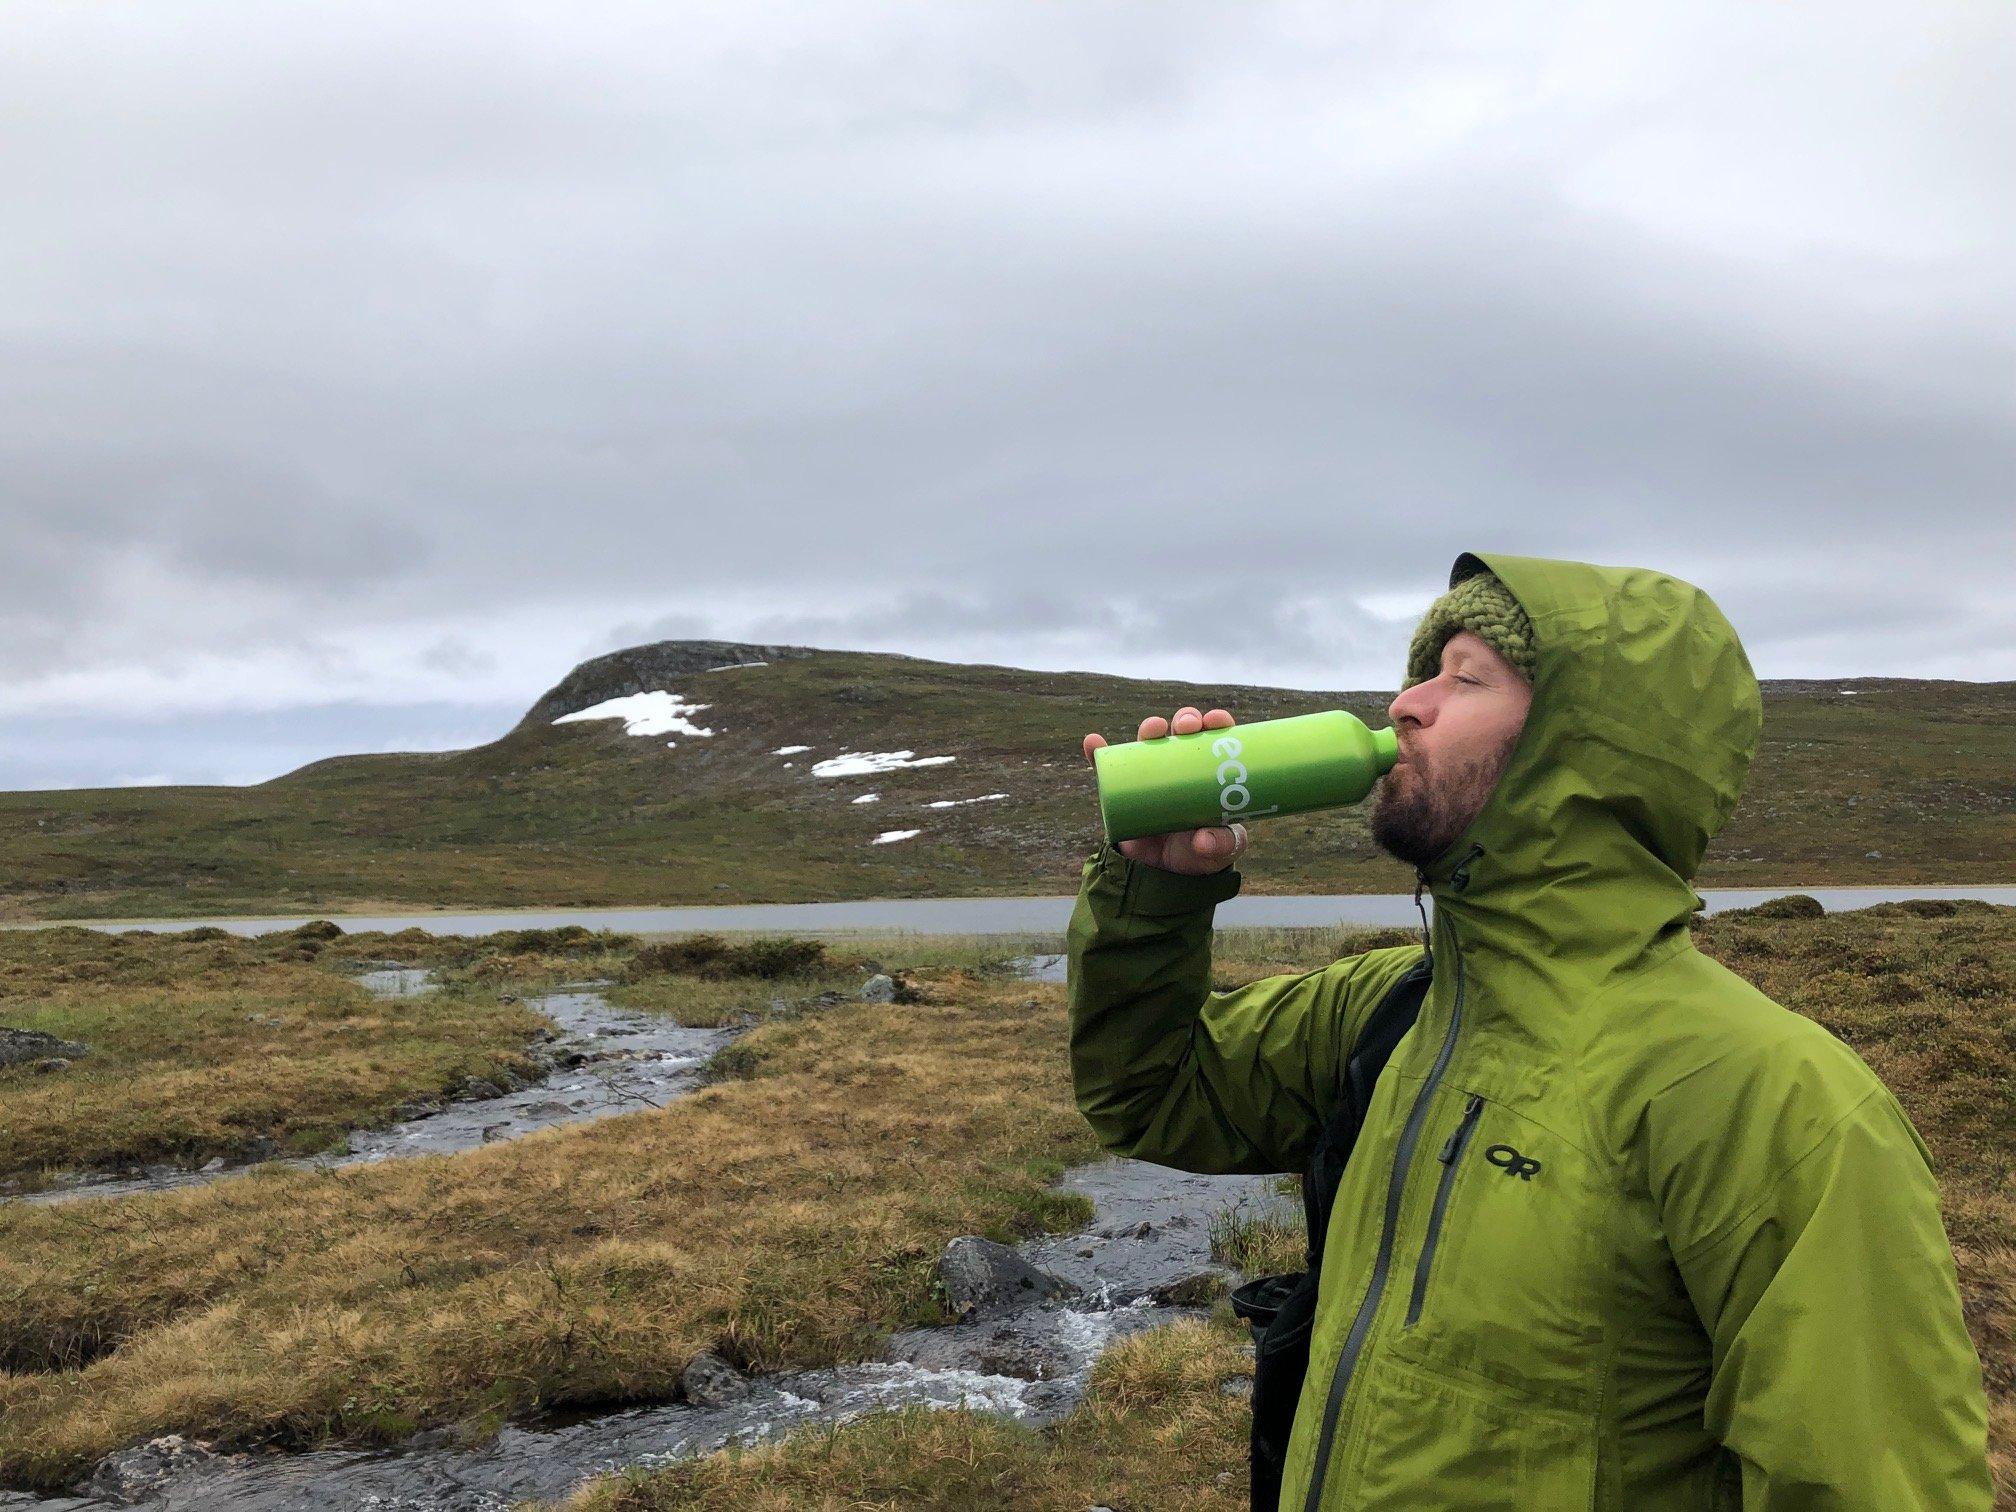 5 - Drinking Water